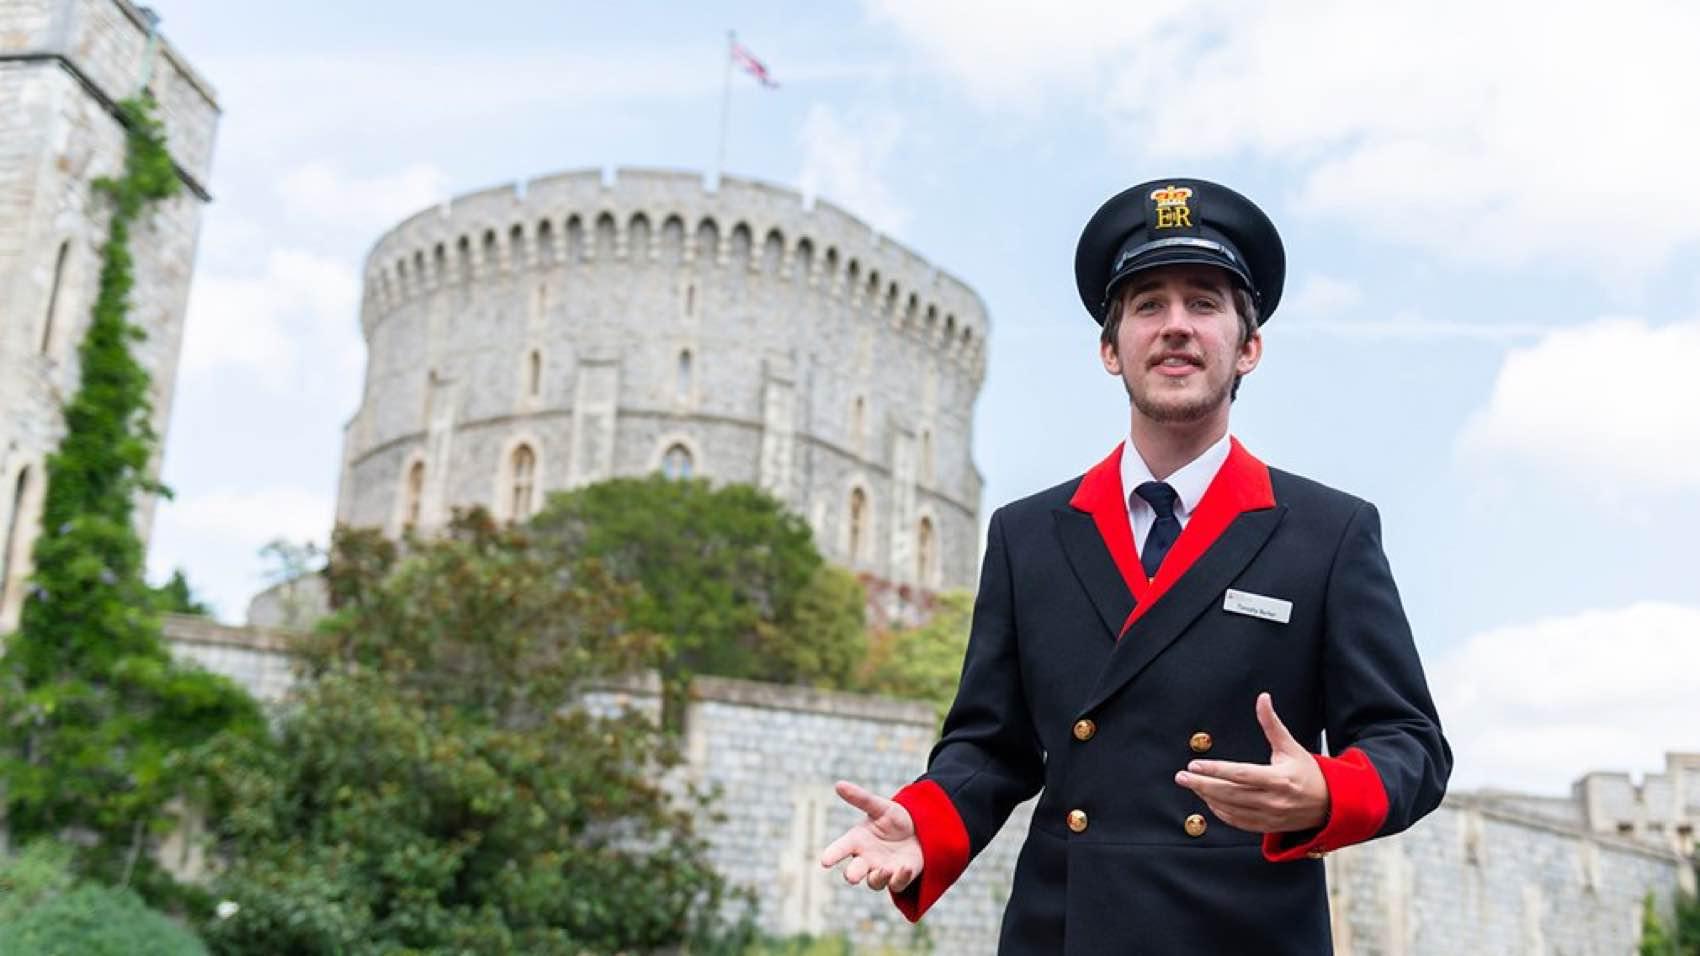 A Guide at Windsor Castle